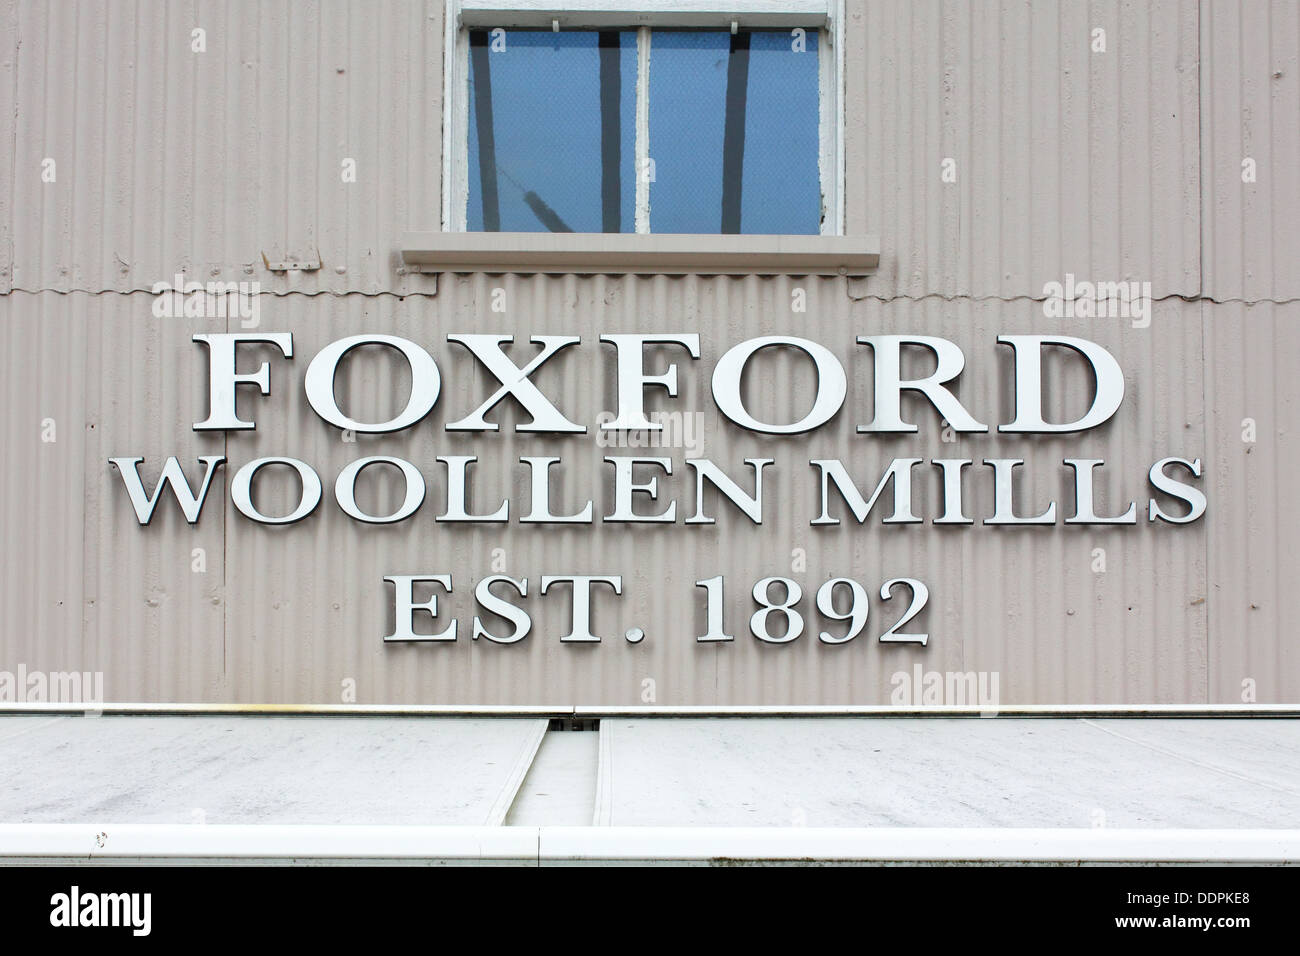 Foxford Woollen Mills,County Mayo, Ireland - Stock Image